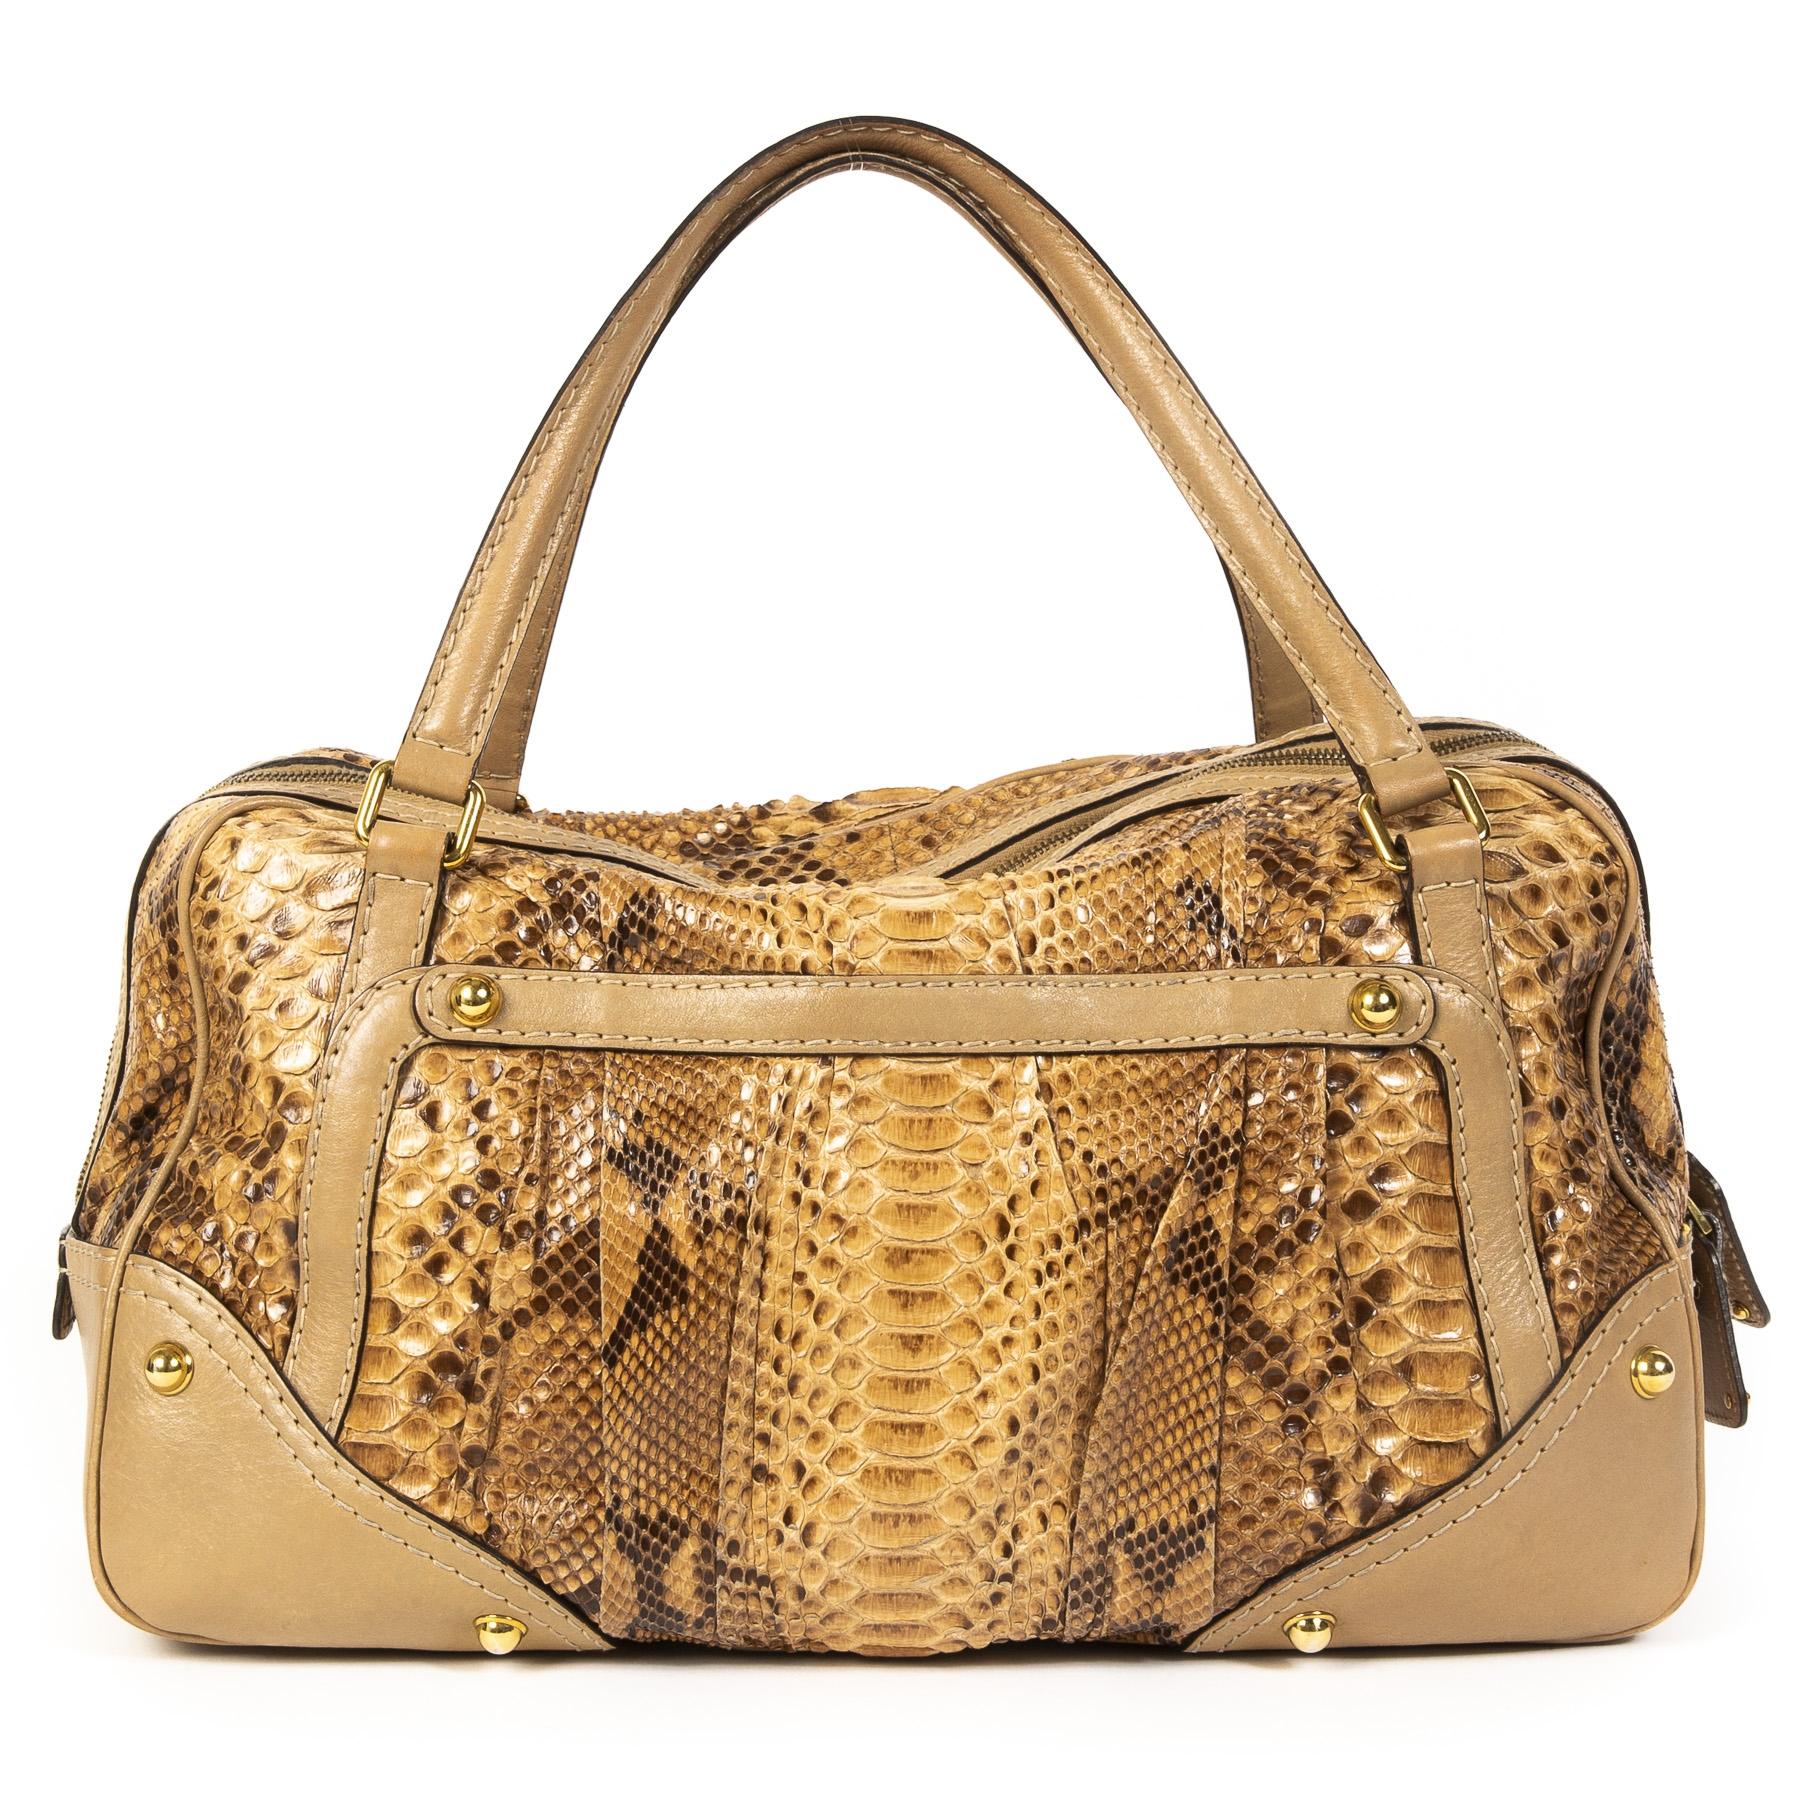 5b92274938abc7 ... koop veilig online tegen de beste prijs Gucci Jockey Boston Bag Python